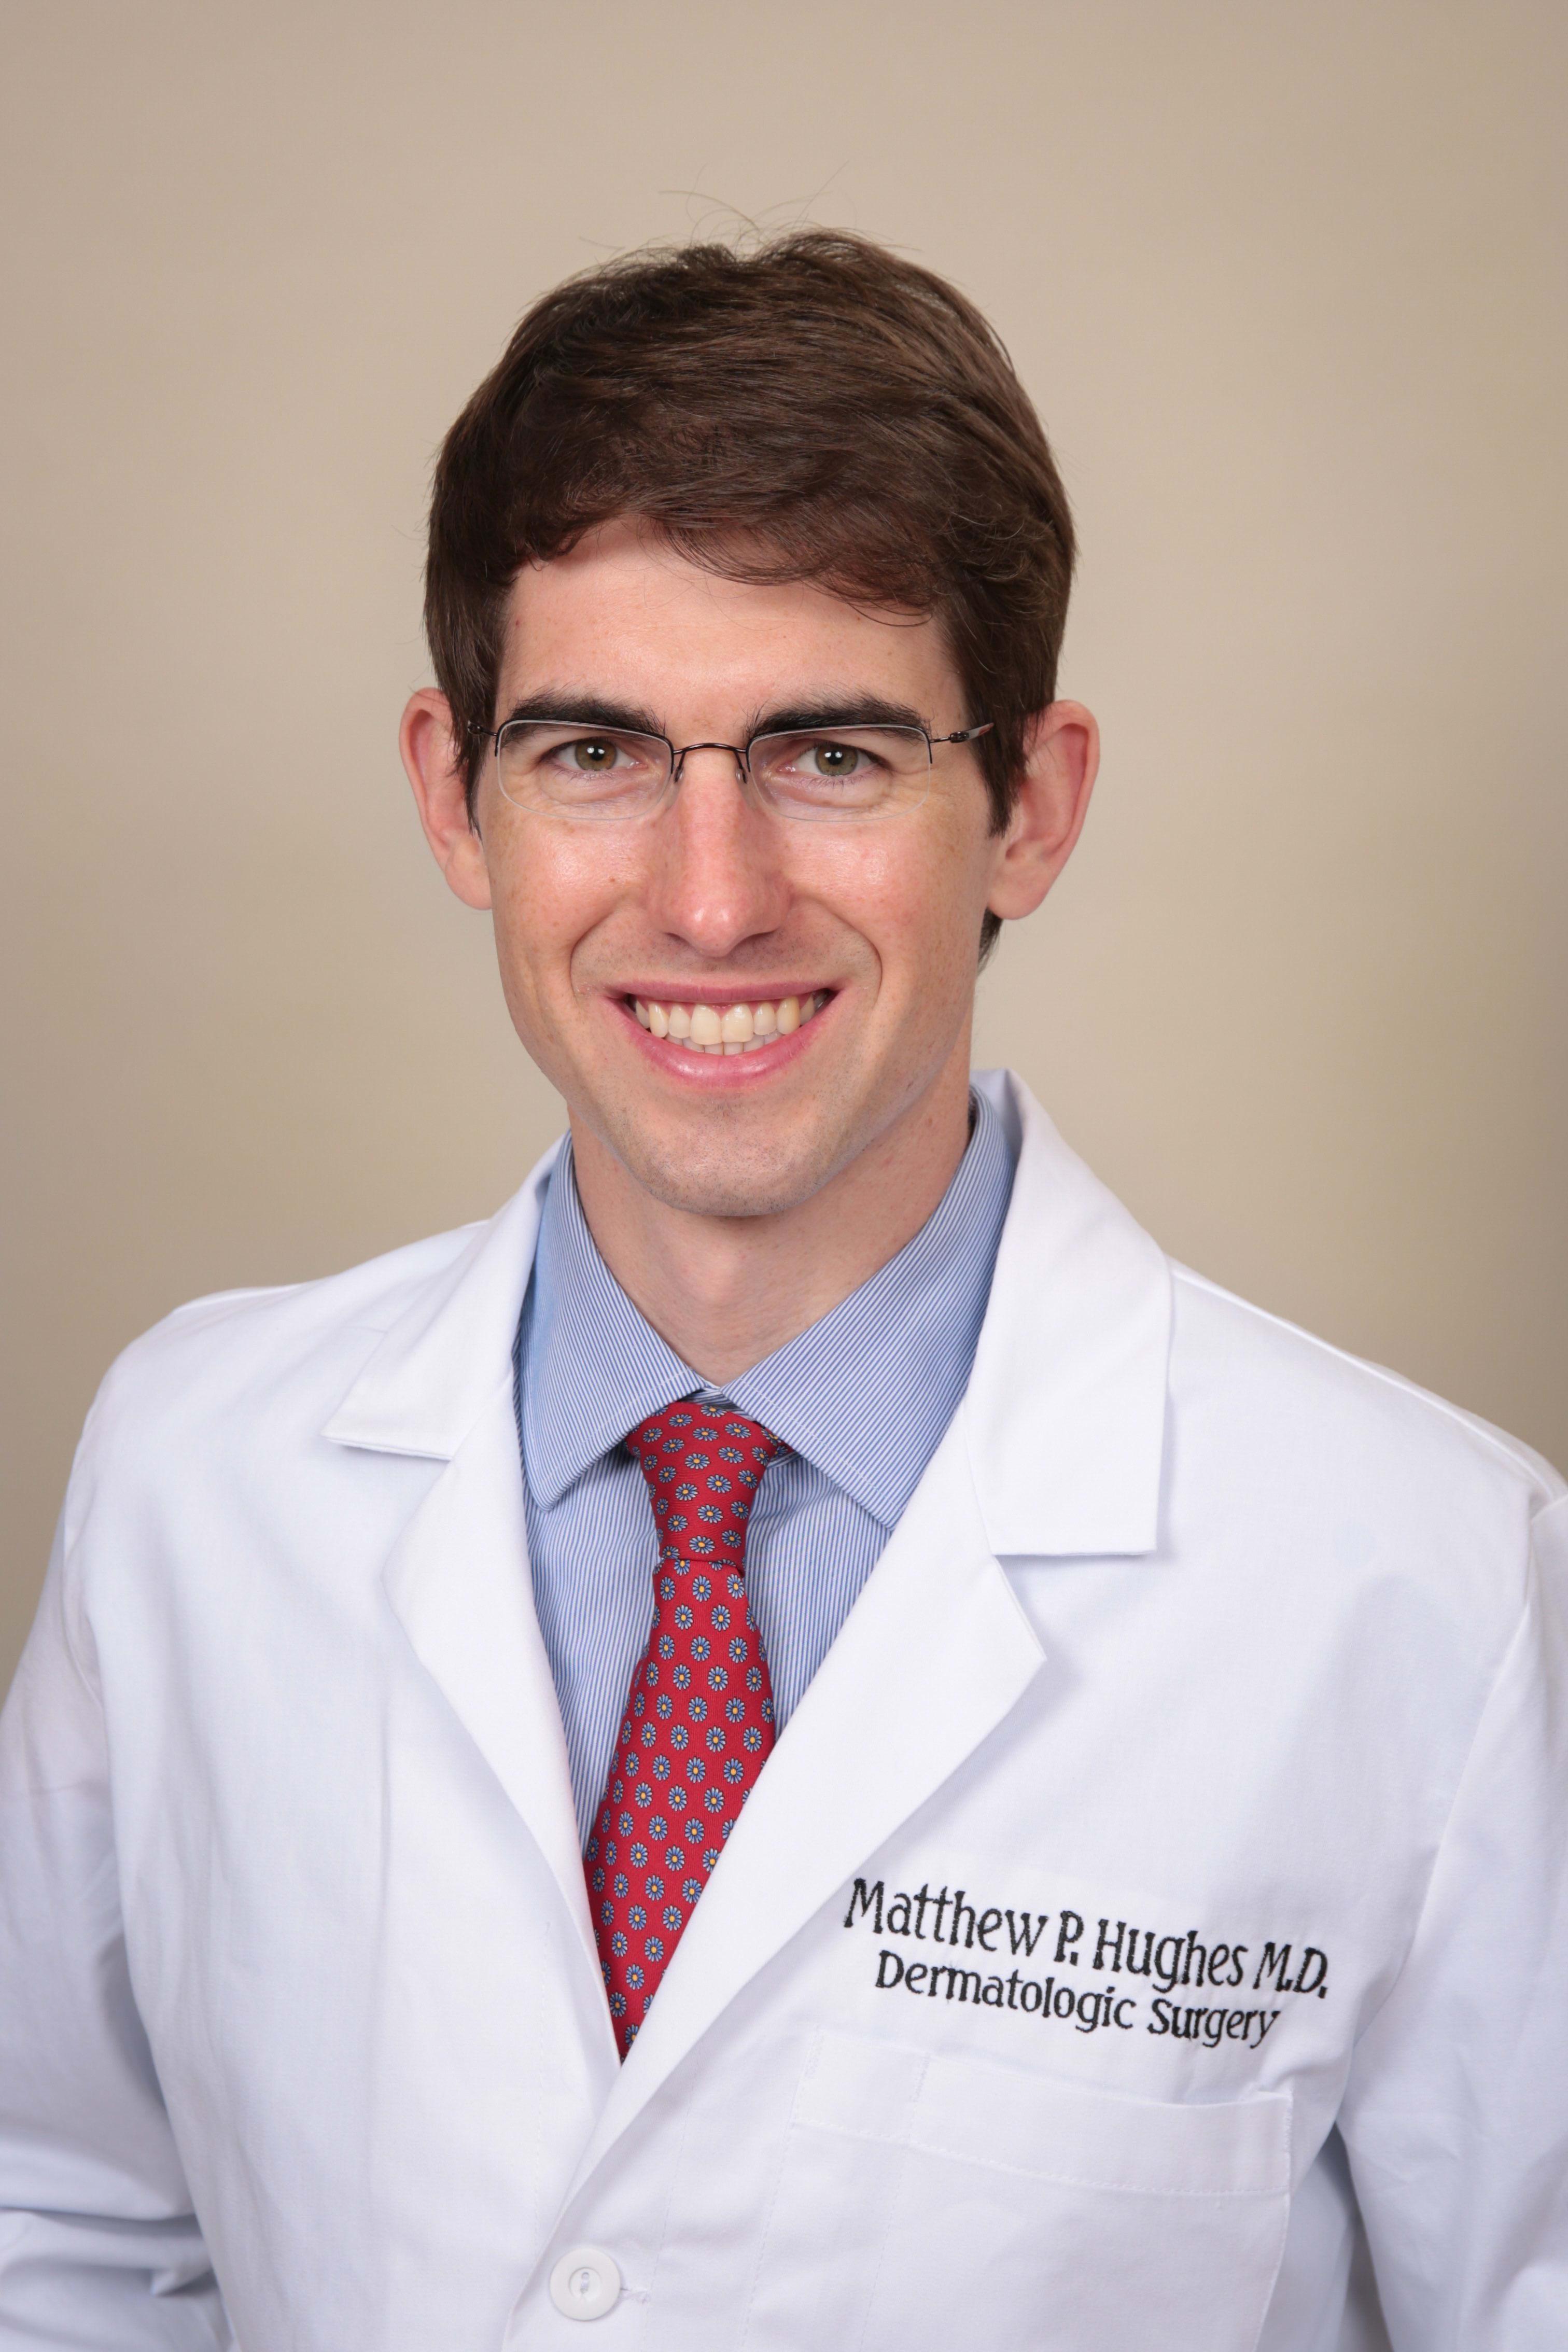 Dr. Matthew P Hughes MD